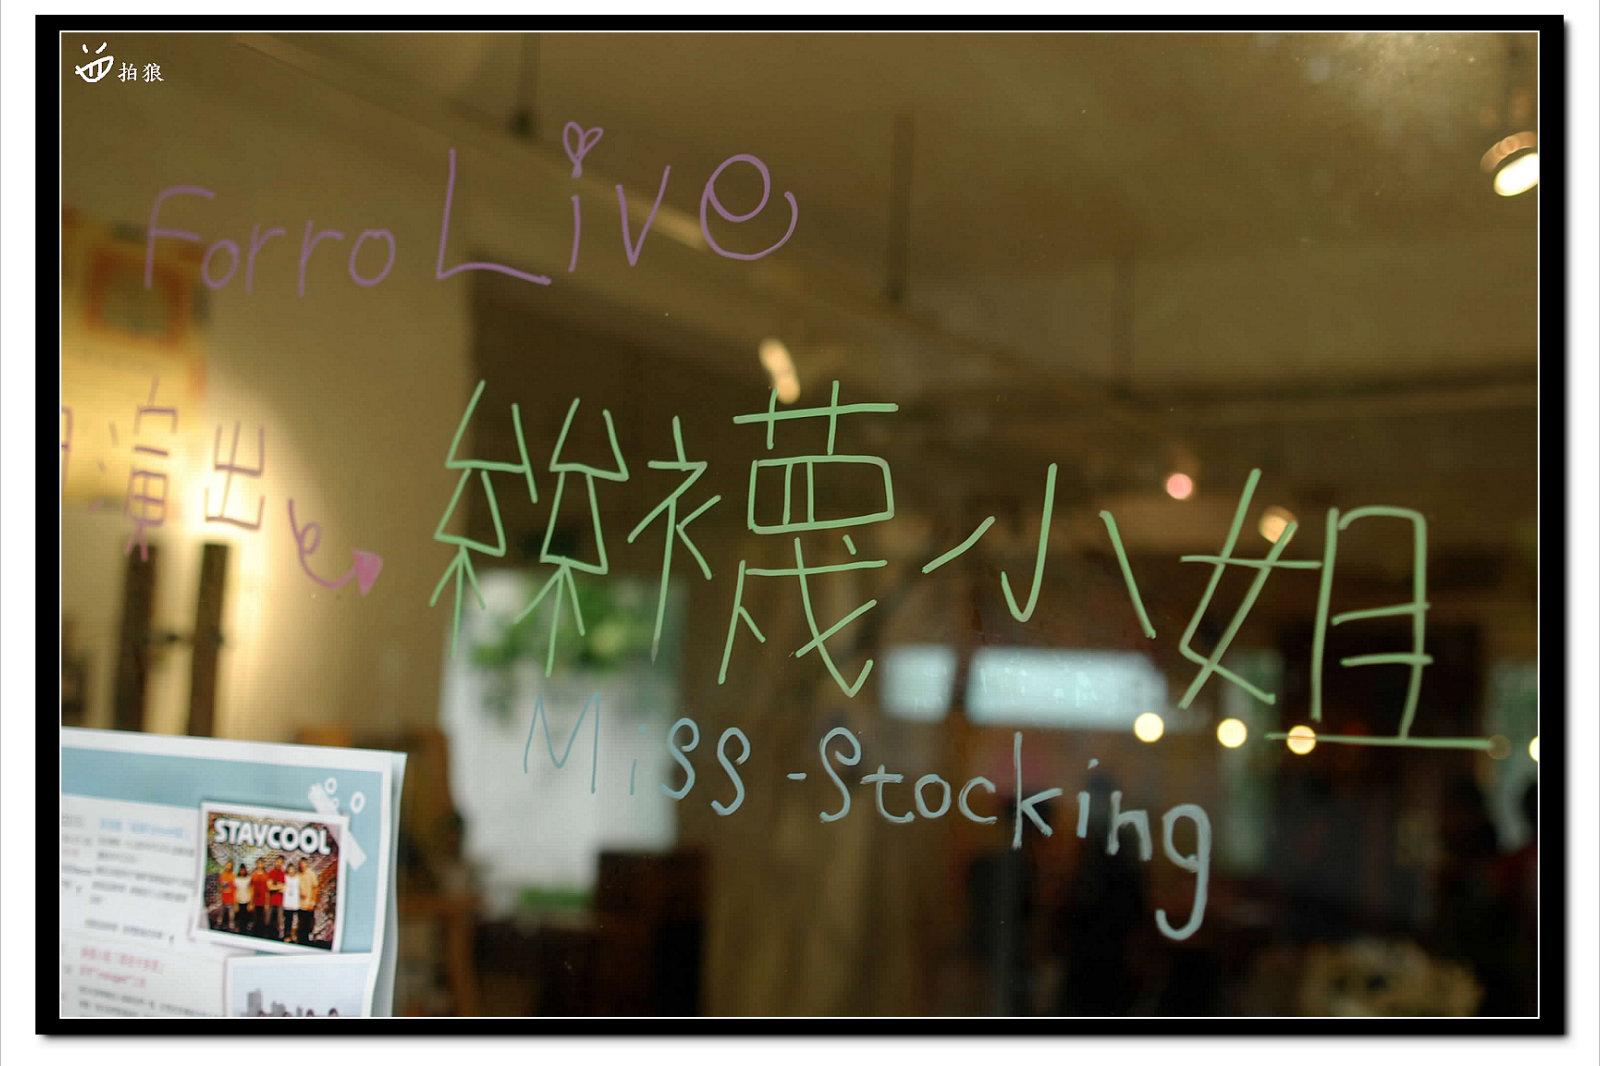 Forro 咖啡 2010.07.24